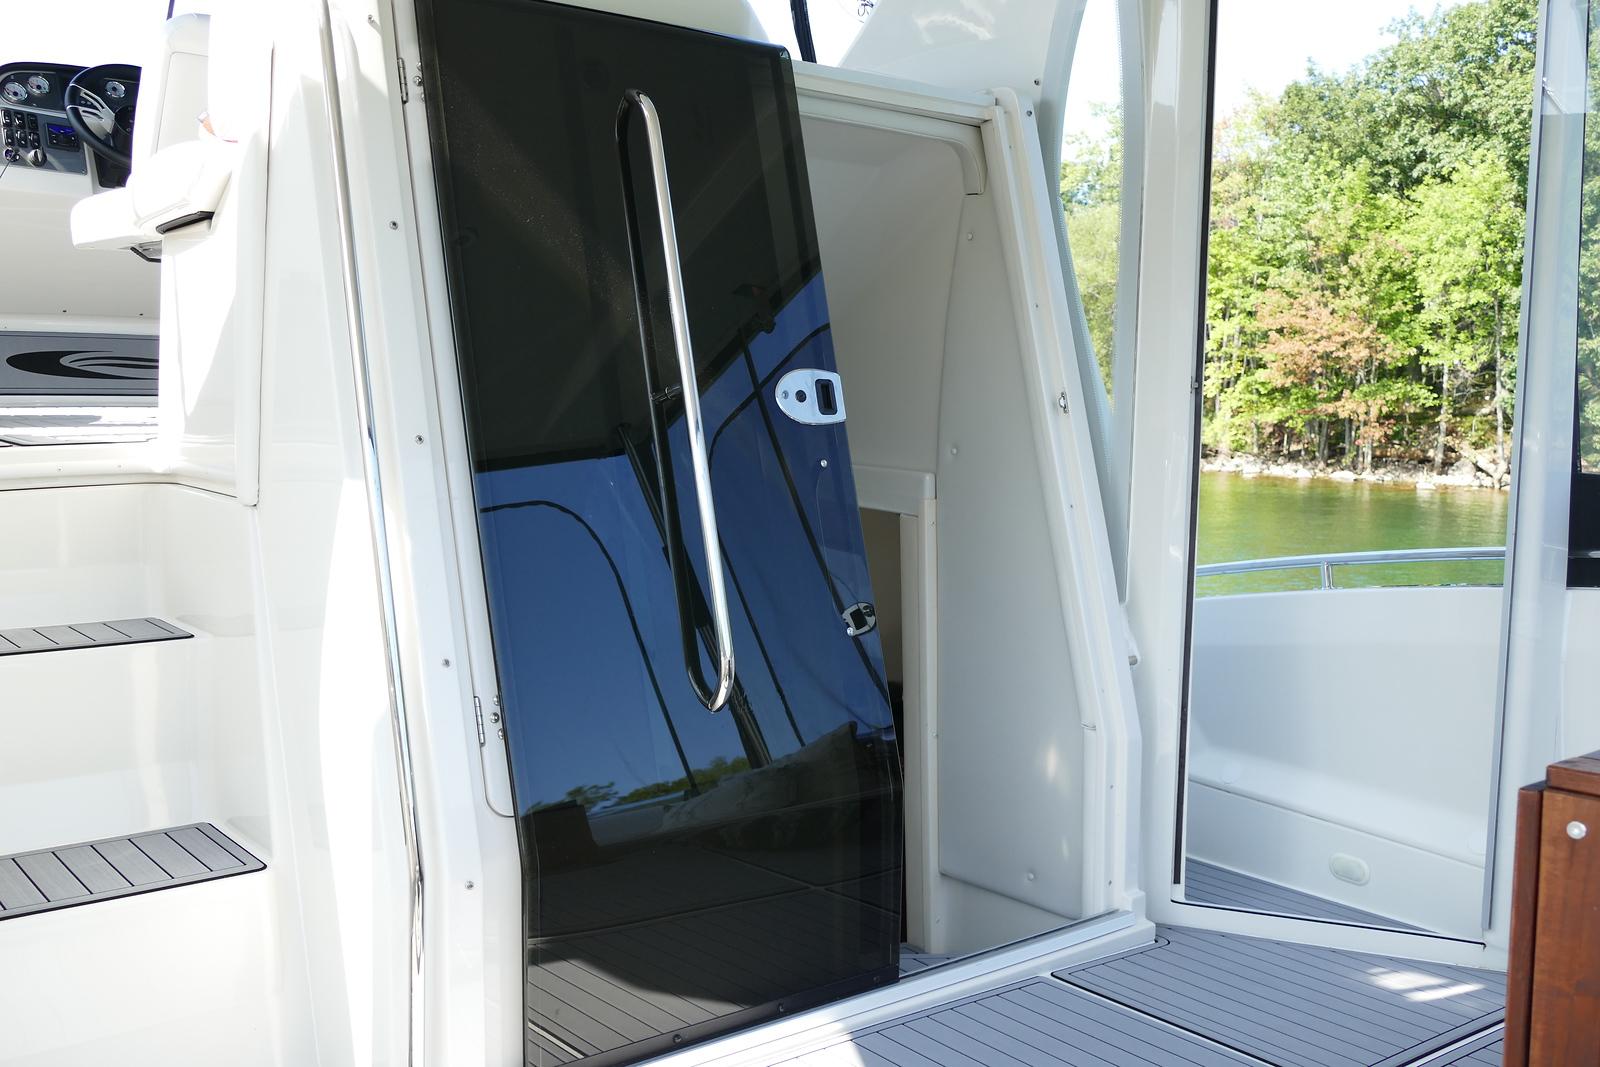 Entrance to the salon via sliding lexan door or on the lower deck via the patio door.